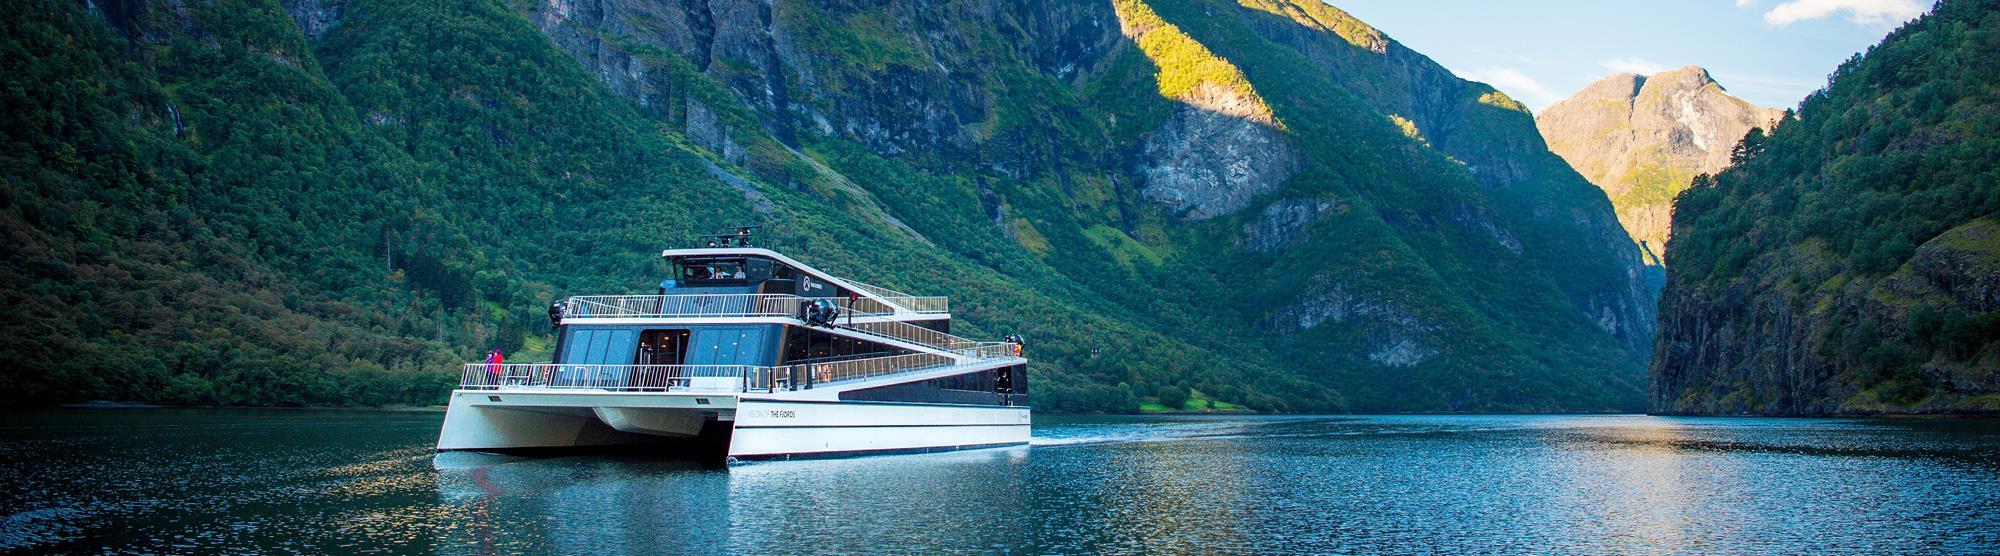 Turer fra Bergen